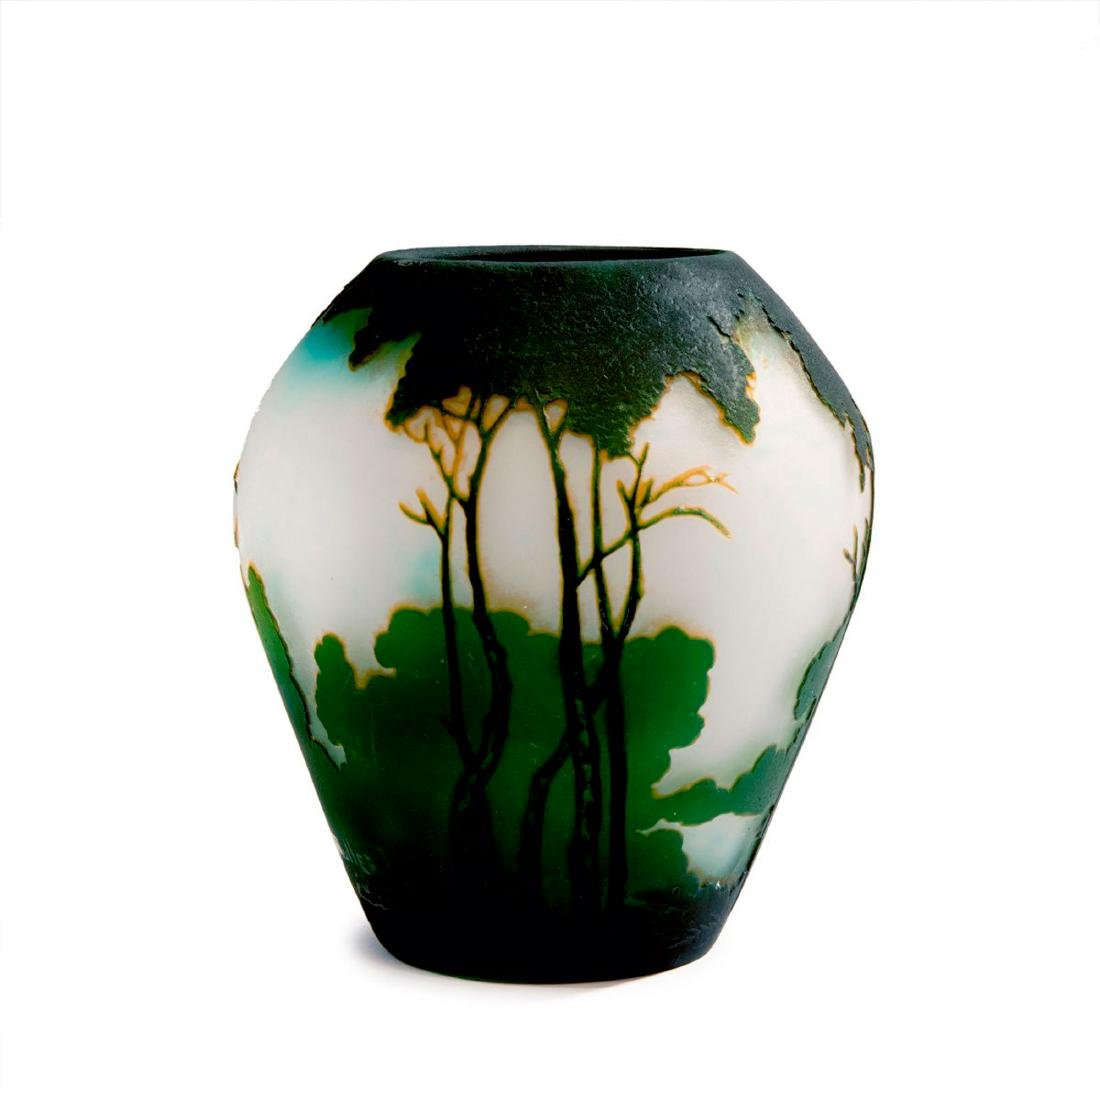 'Paysage' vase, 1920s